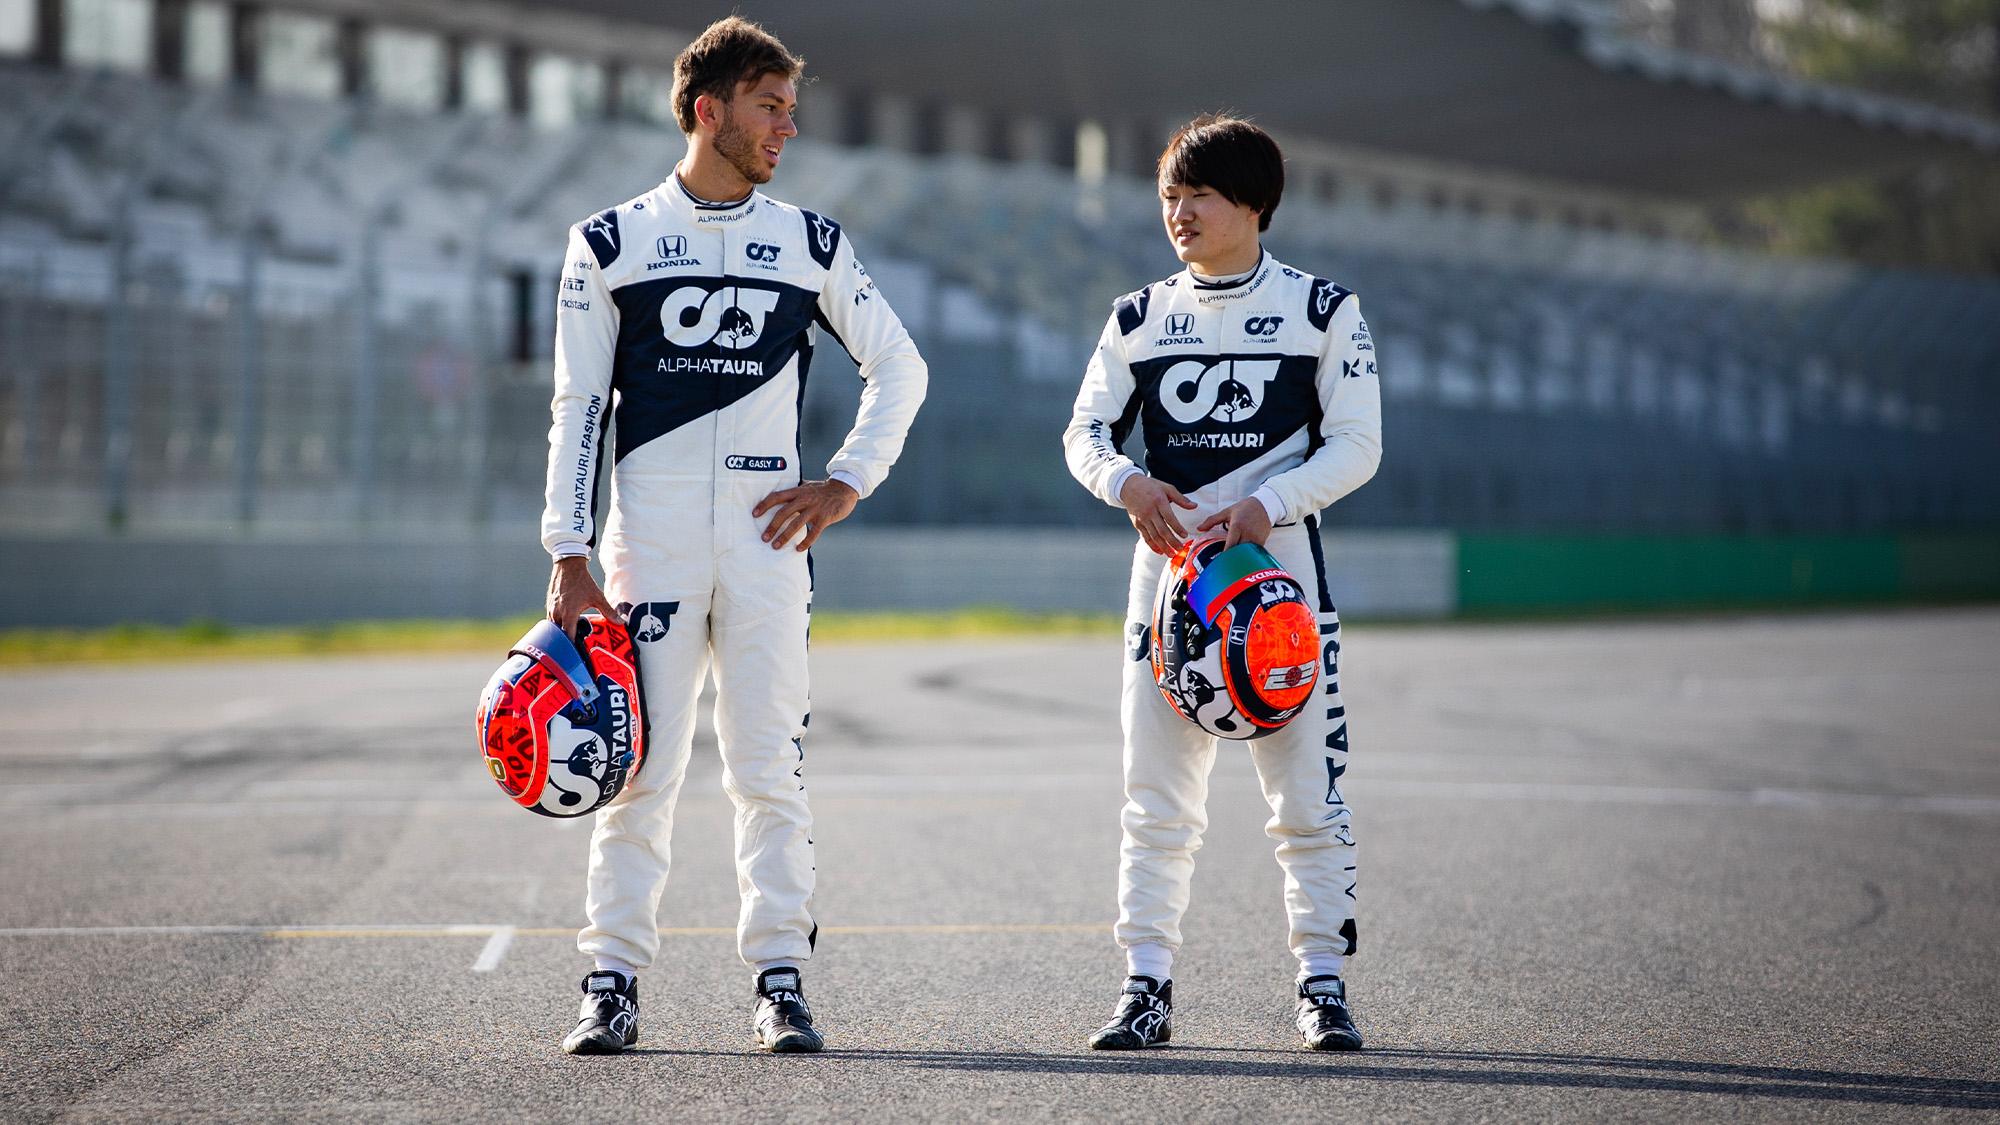 Pierre Gasly and Yuki Tsunoda ahead of the 2021 F1 season